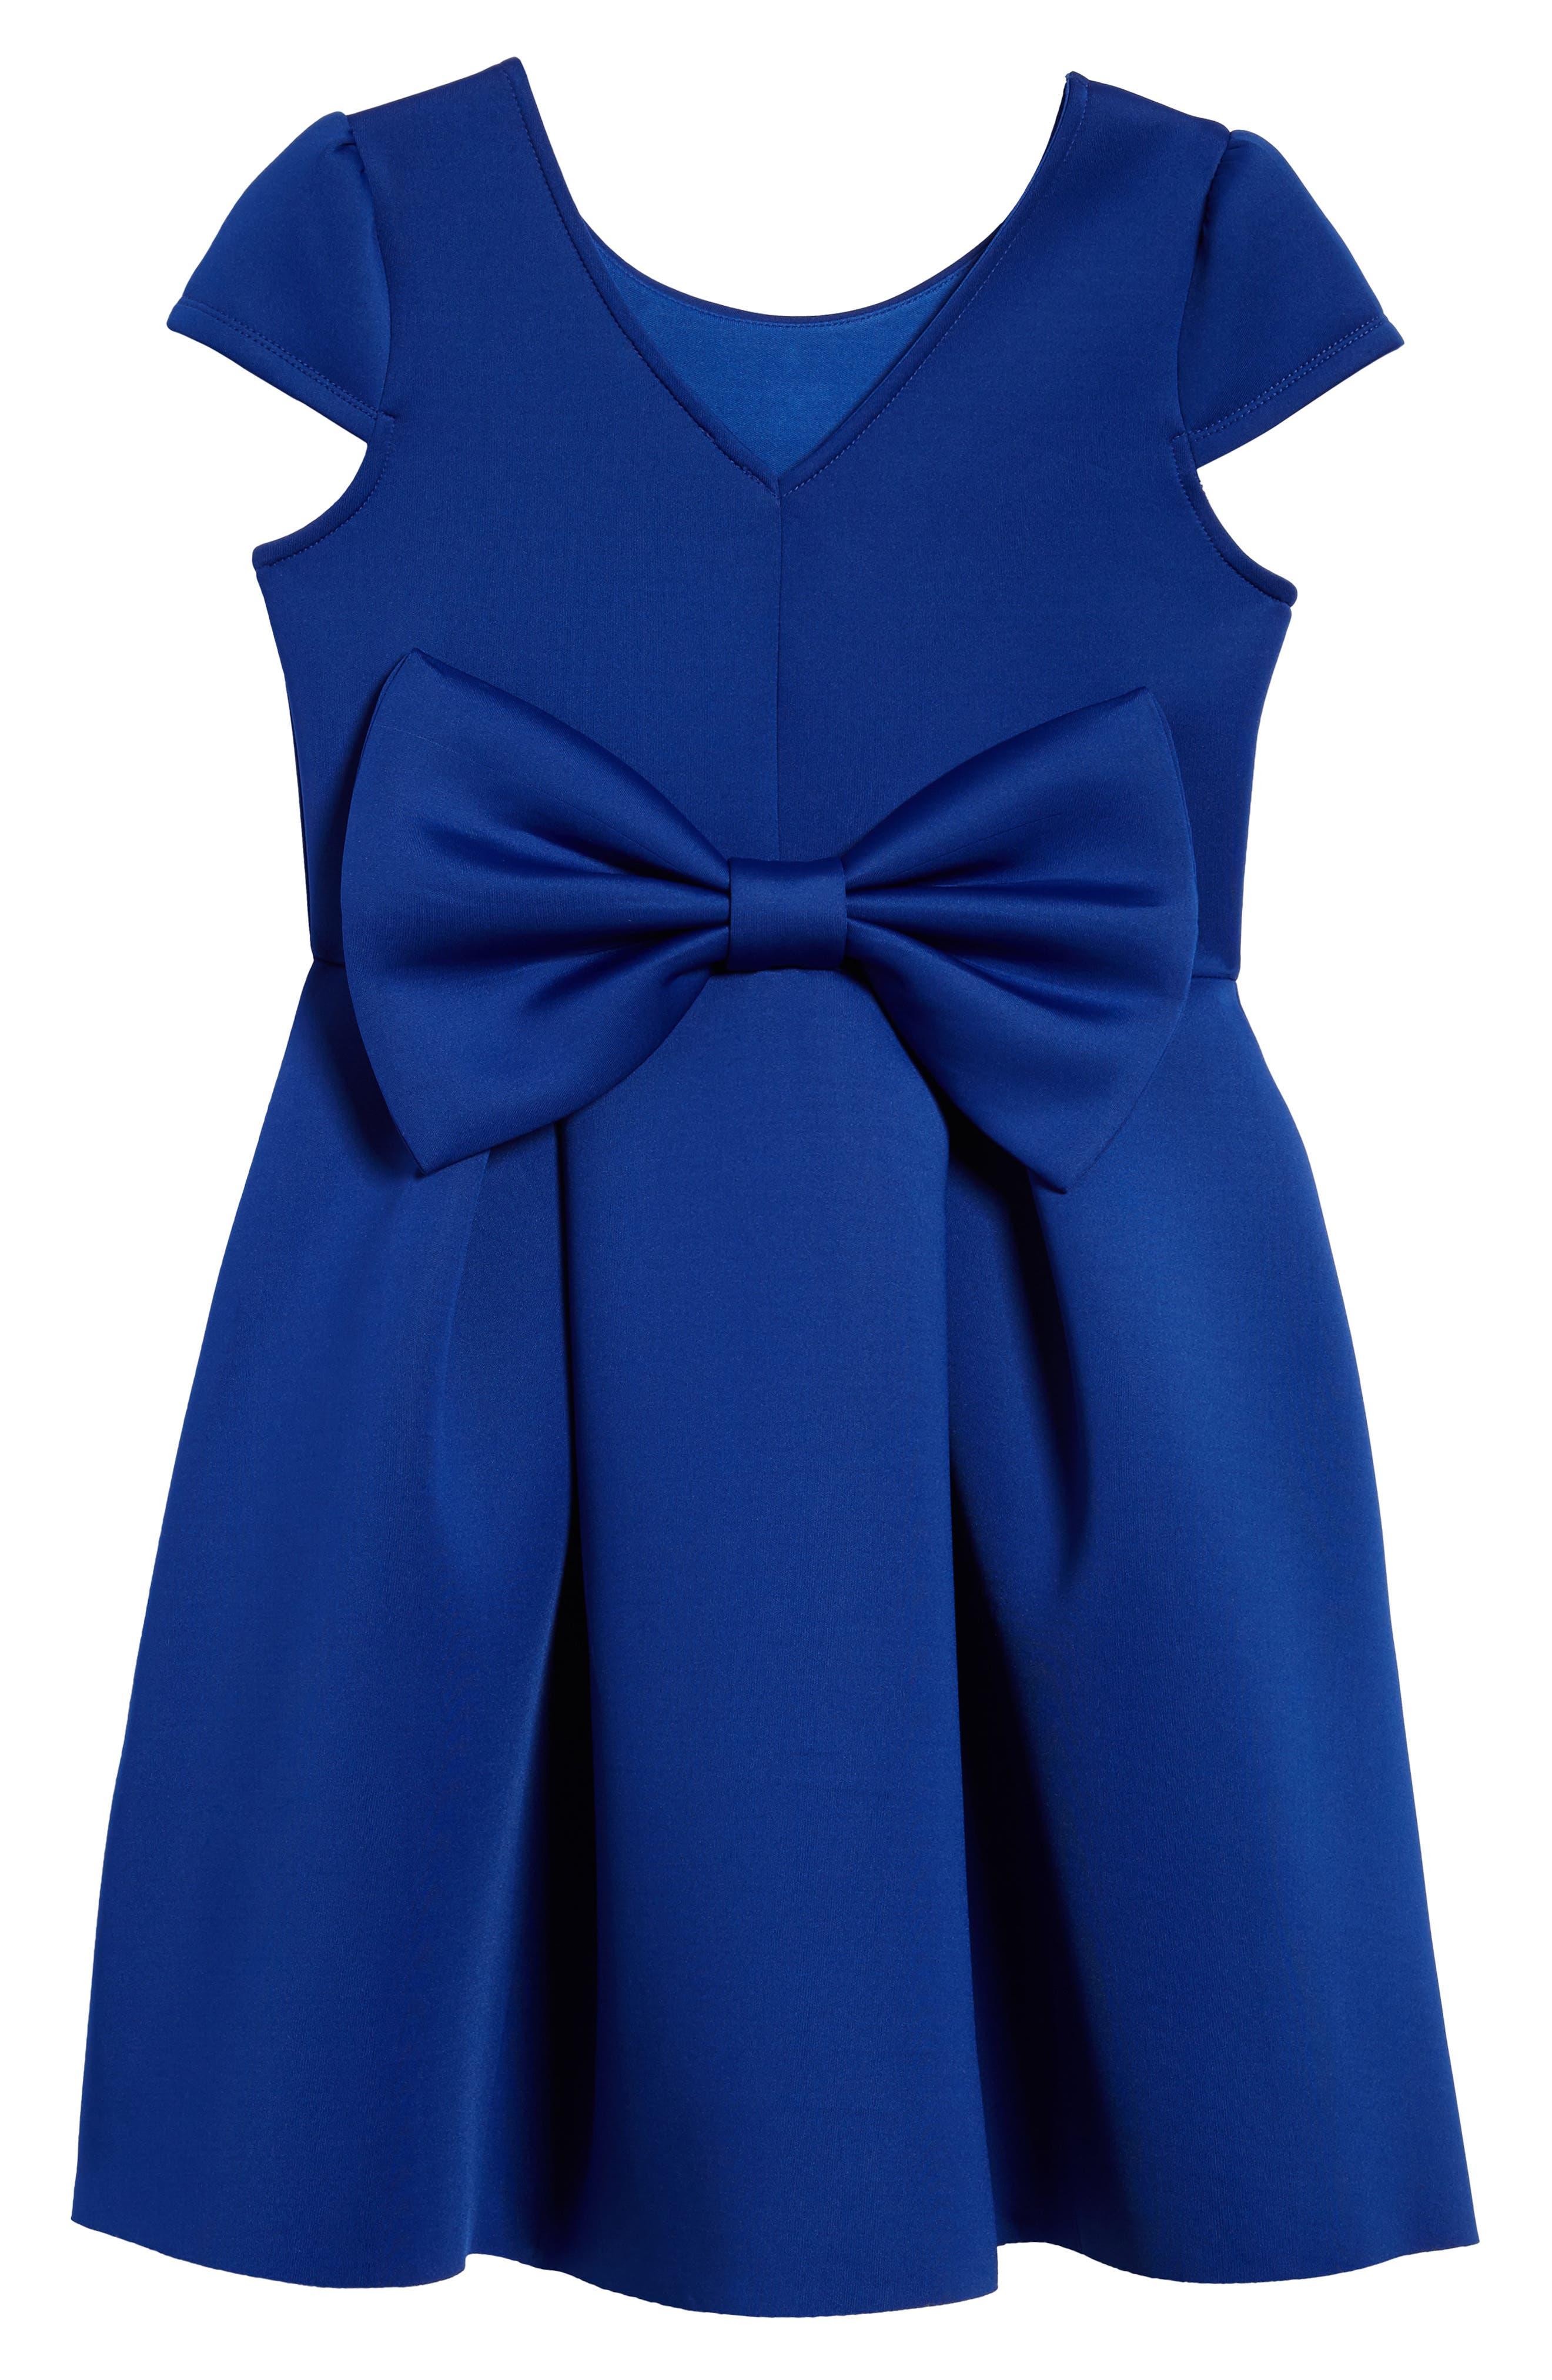 Embellished Scuba Dress,                             Alternate thumbnail 2, color,                             Royal